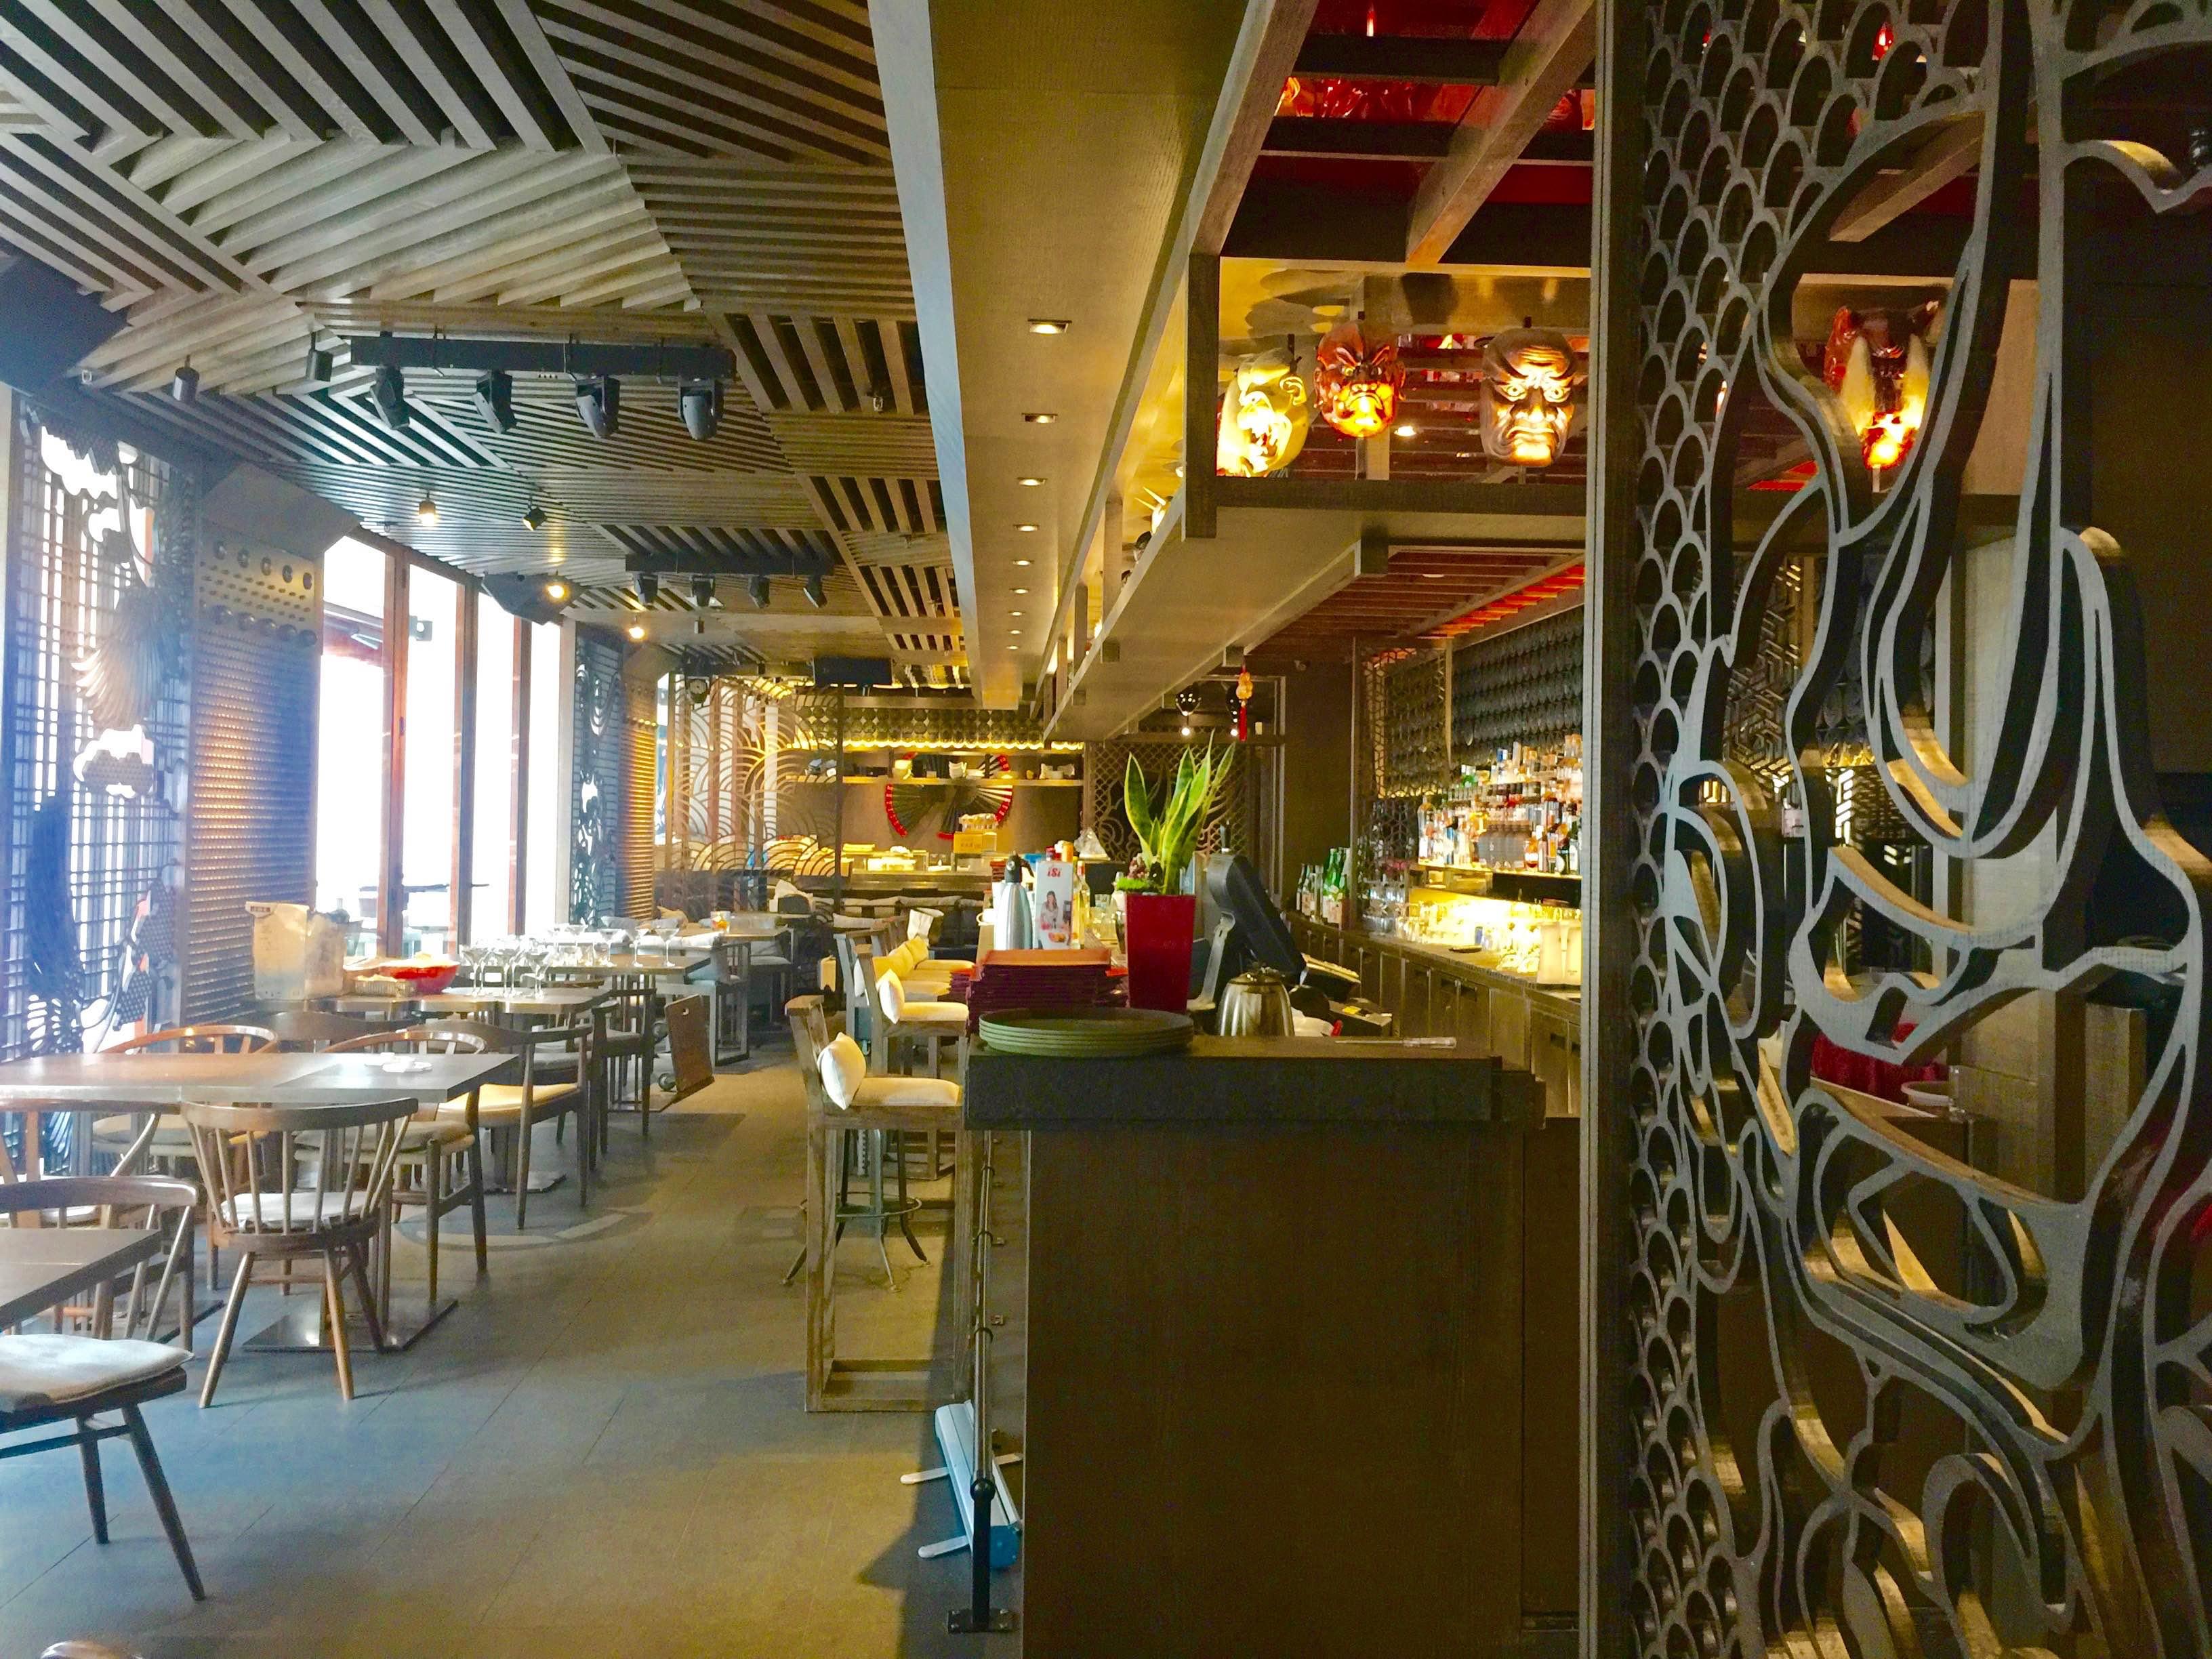 Fitted restaurant bar in Central for Lease Surrender